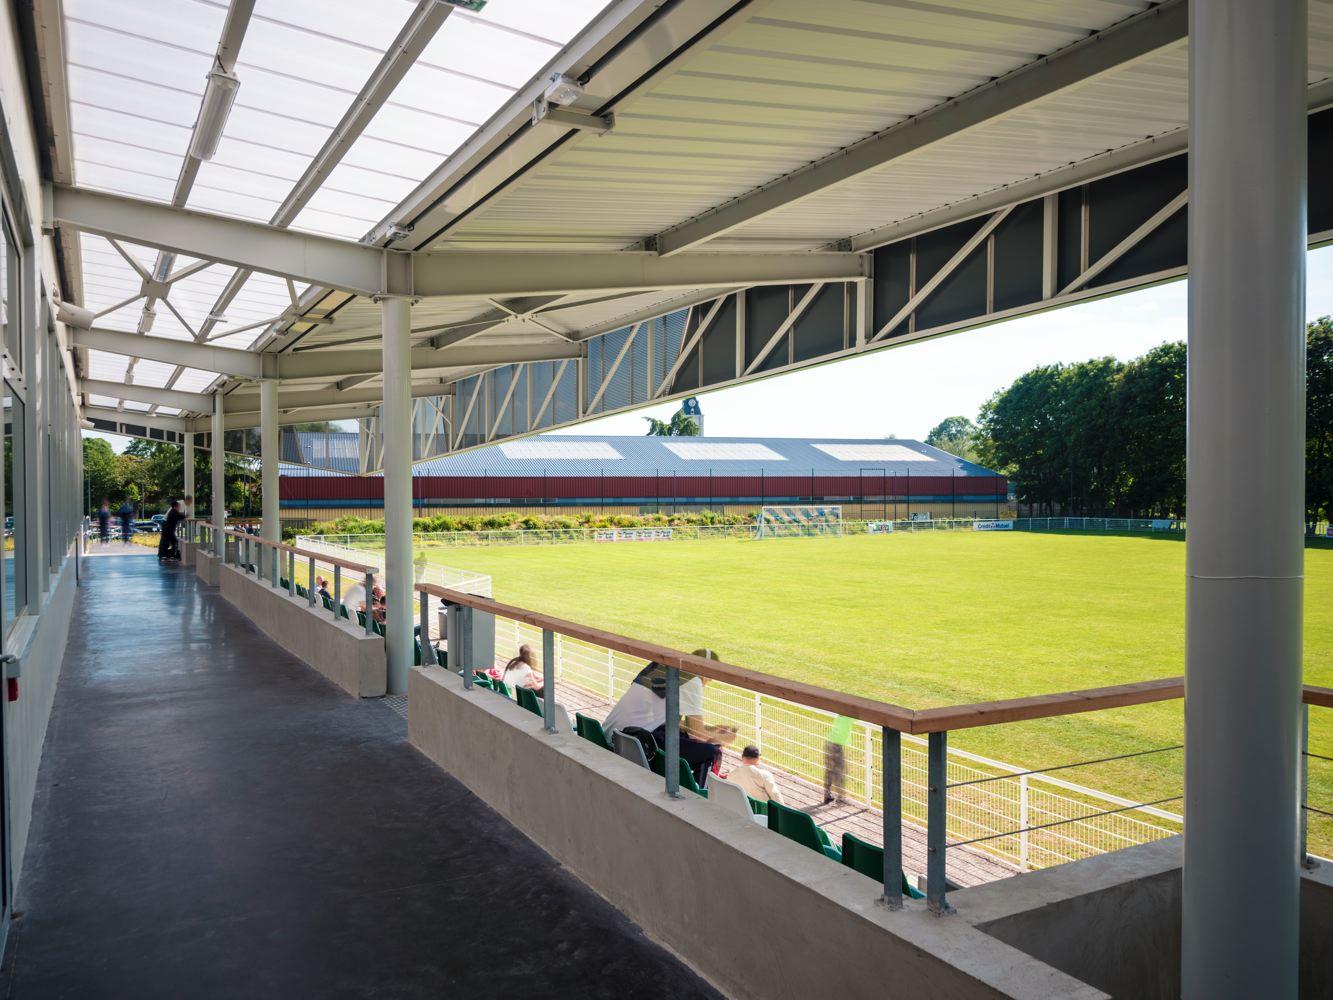 LDKphoto-EFarchi-Stade-Jean-Jacques-025.jpg